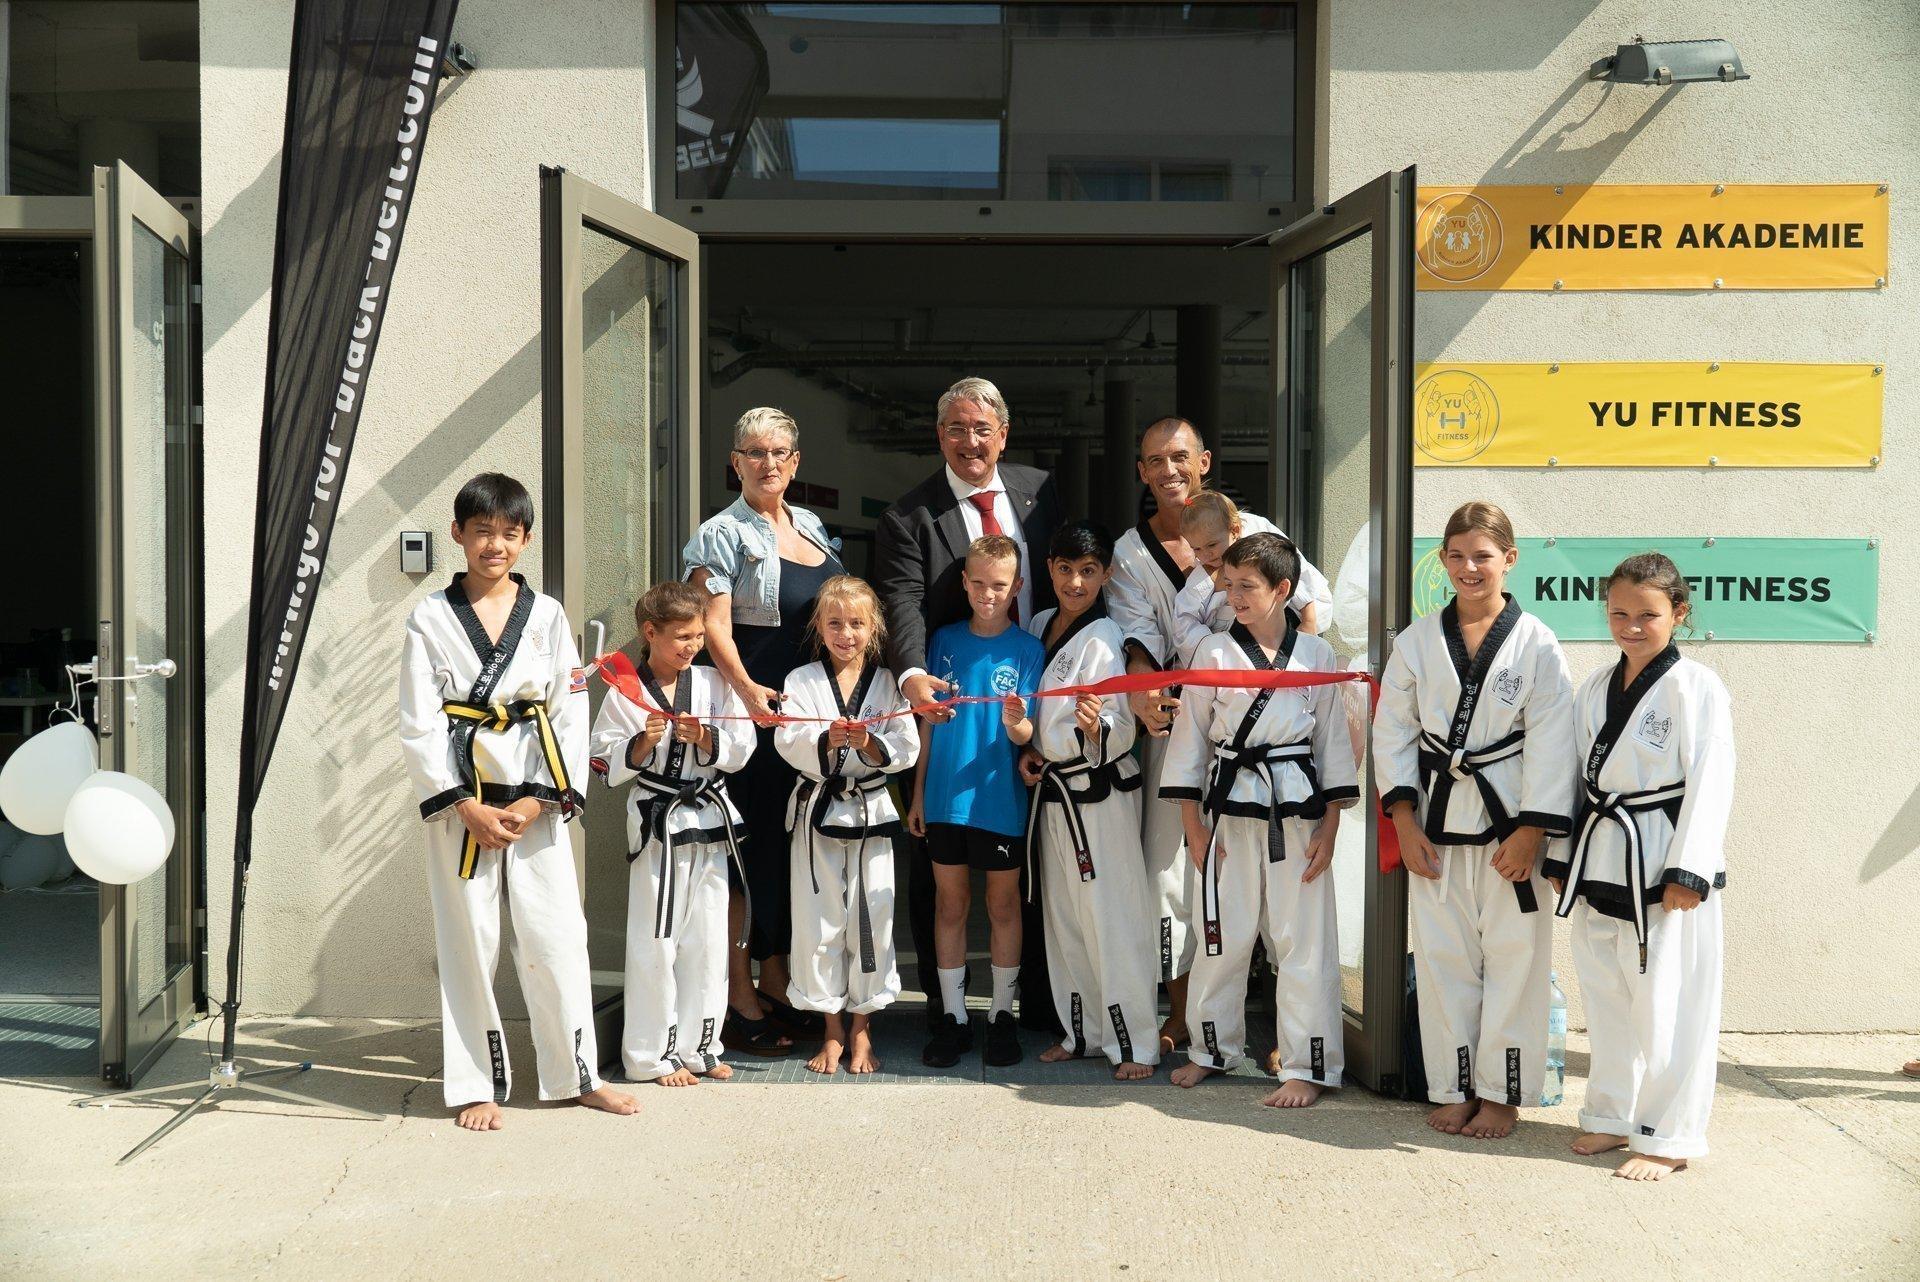 YOUNG-UNG Taekwondo BIG YU Kinderfitness Kampfsport Wagramer Straße